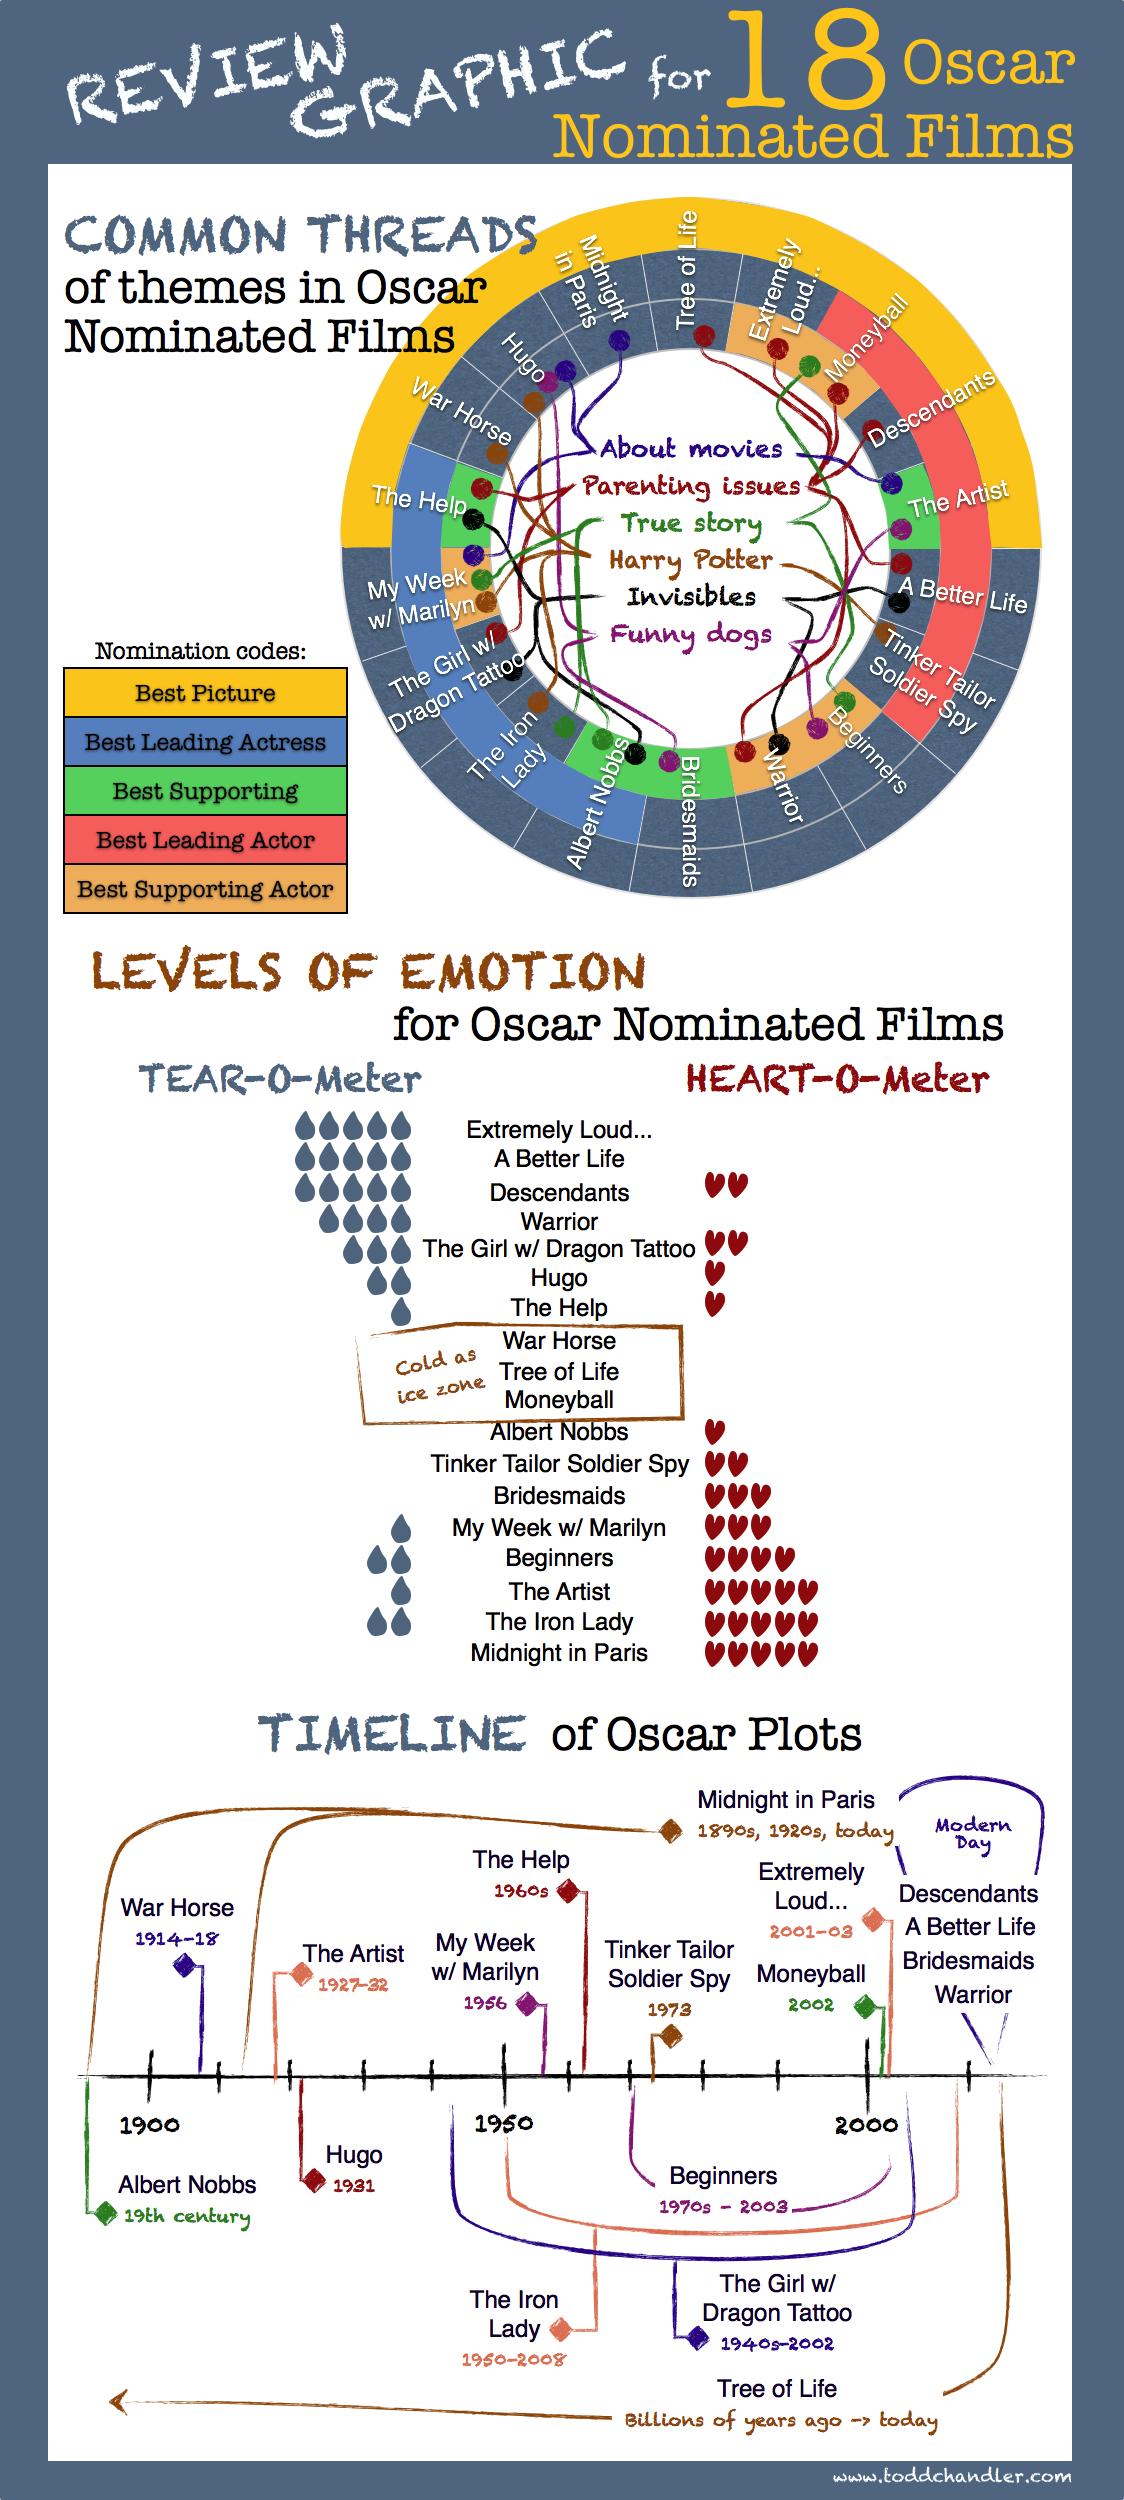 oscar review graphic.jpg